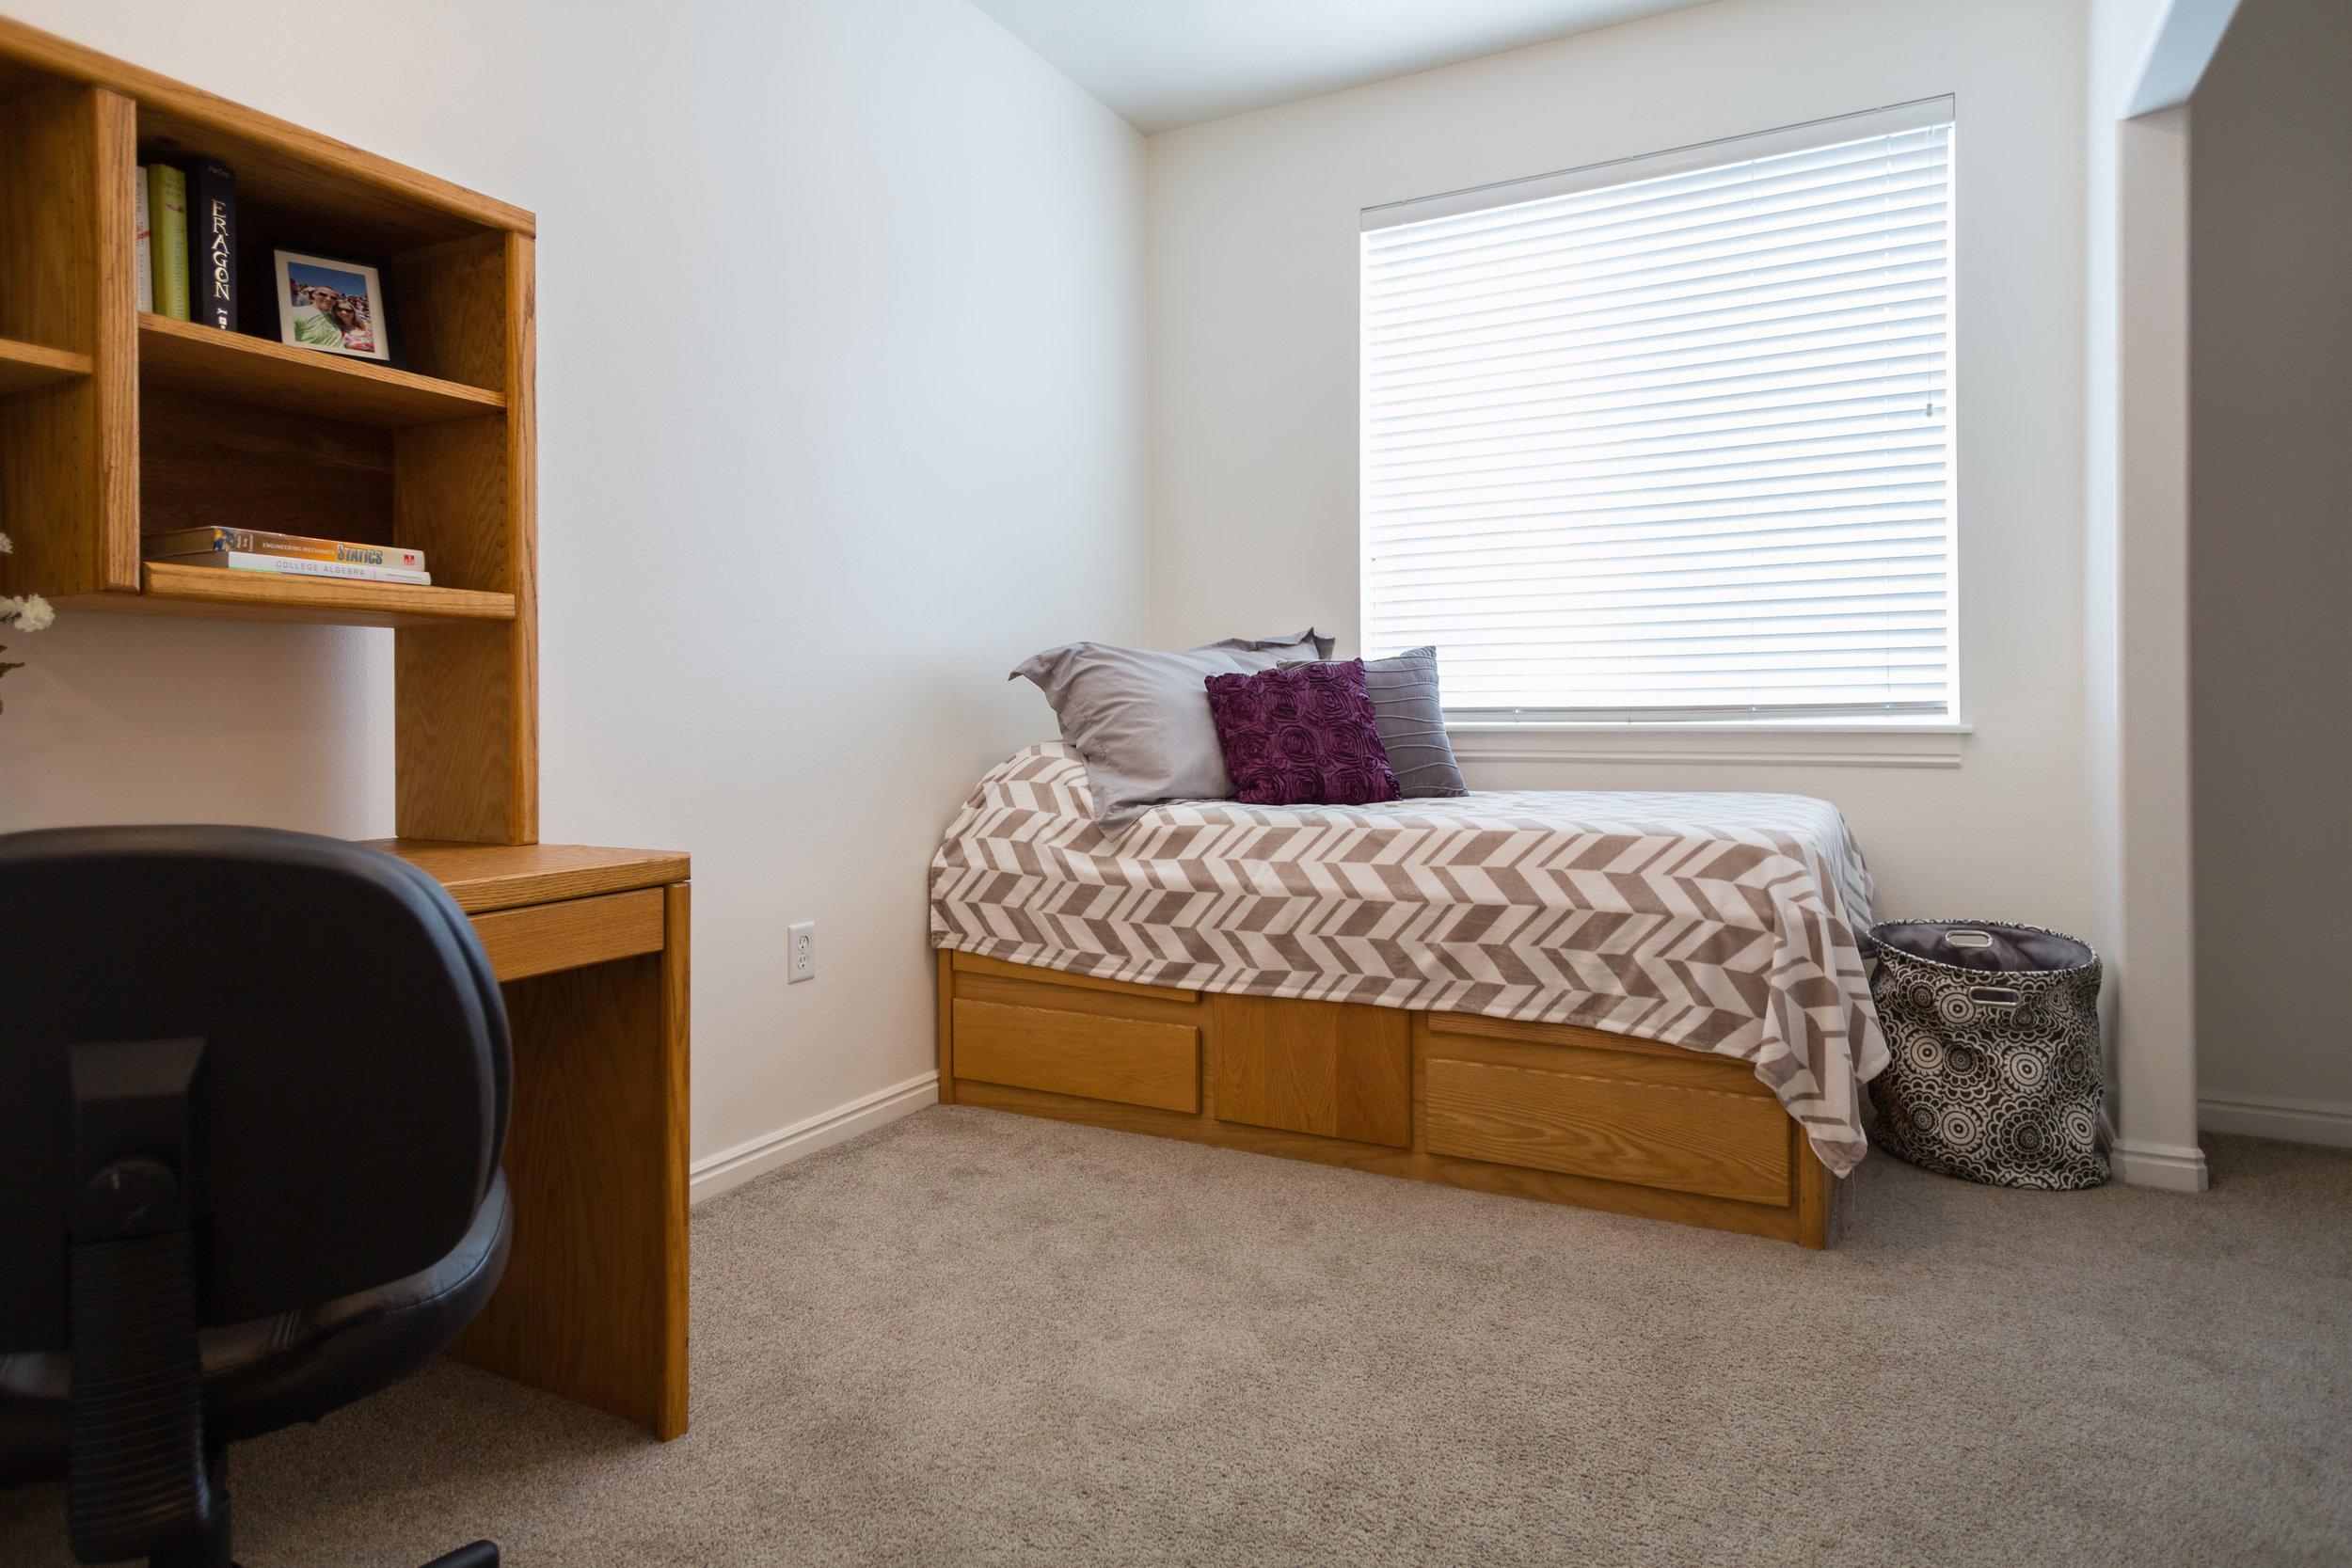 07-22-15 - Bedroom.jpg